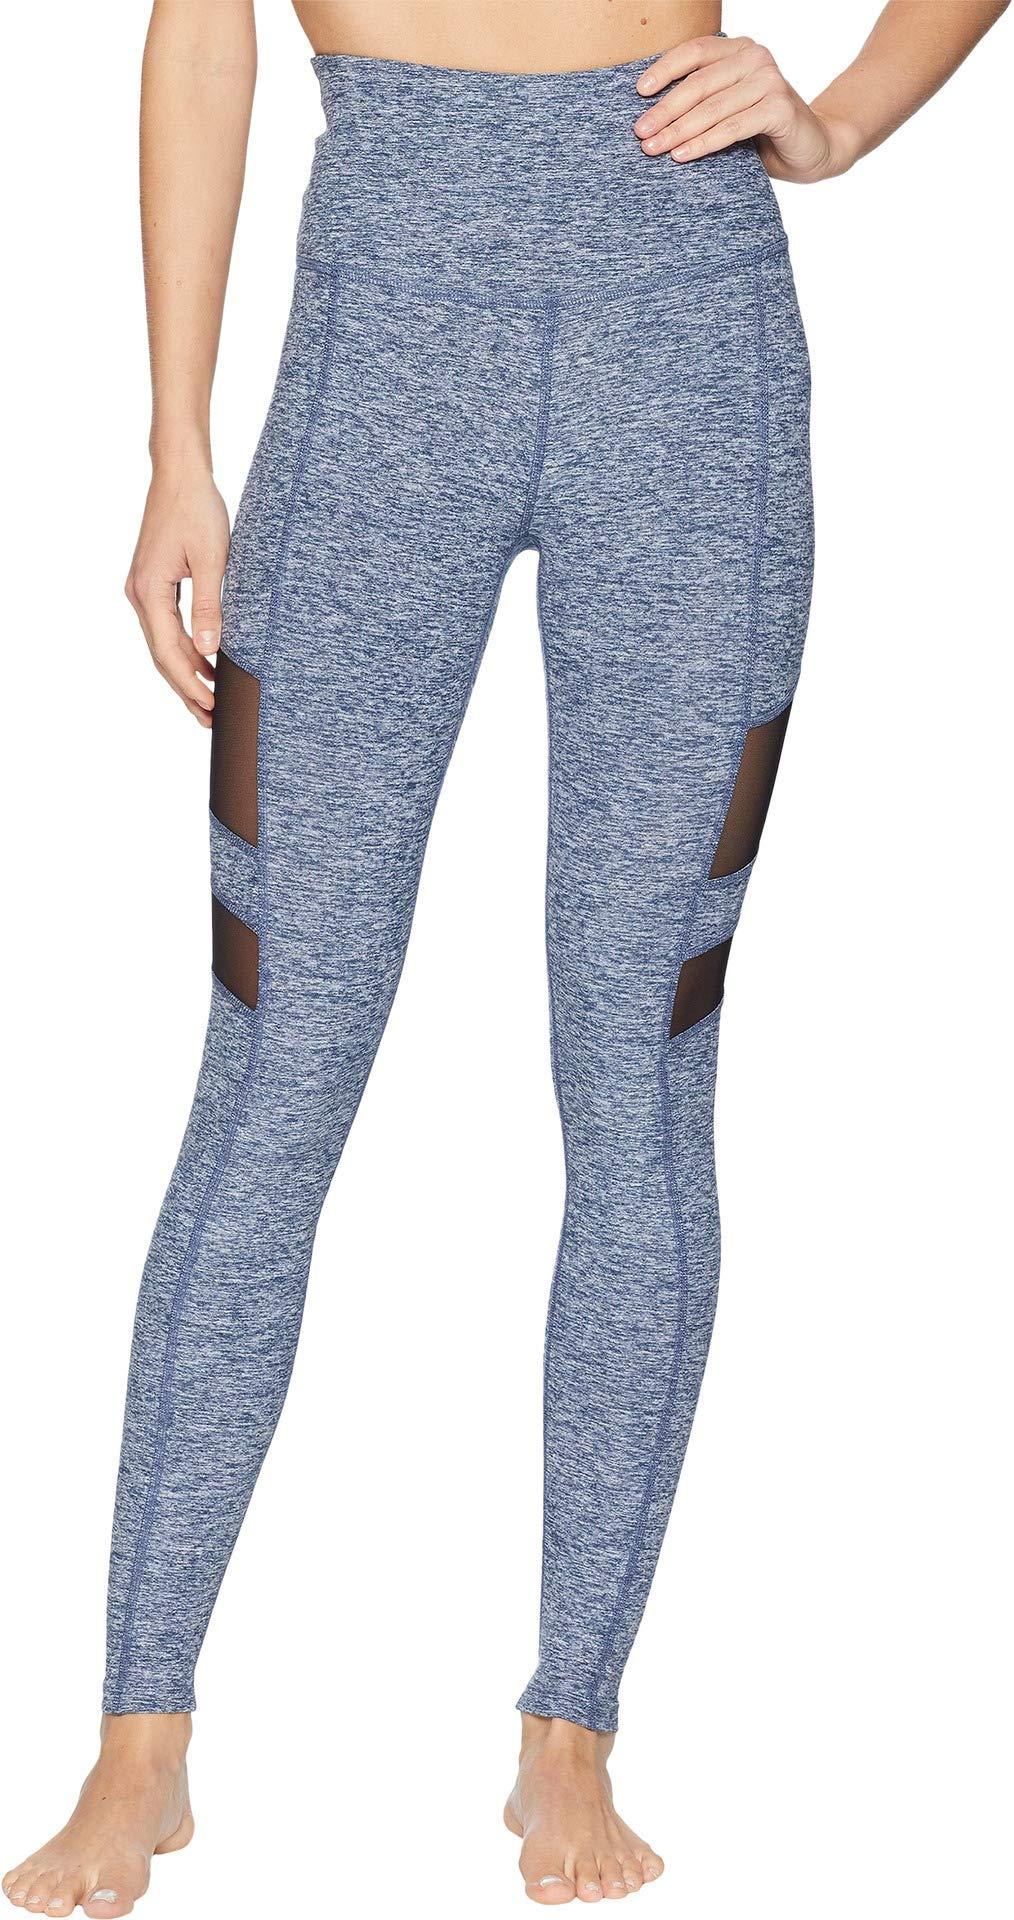 Beyond Yoga Women's Spacedye Rise Above Long Leggings White/Outlaw Navy X-Small 27.5 27.5